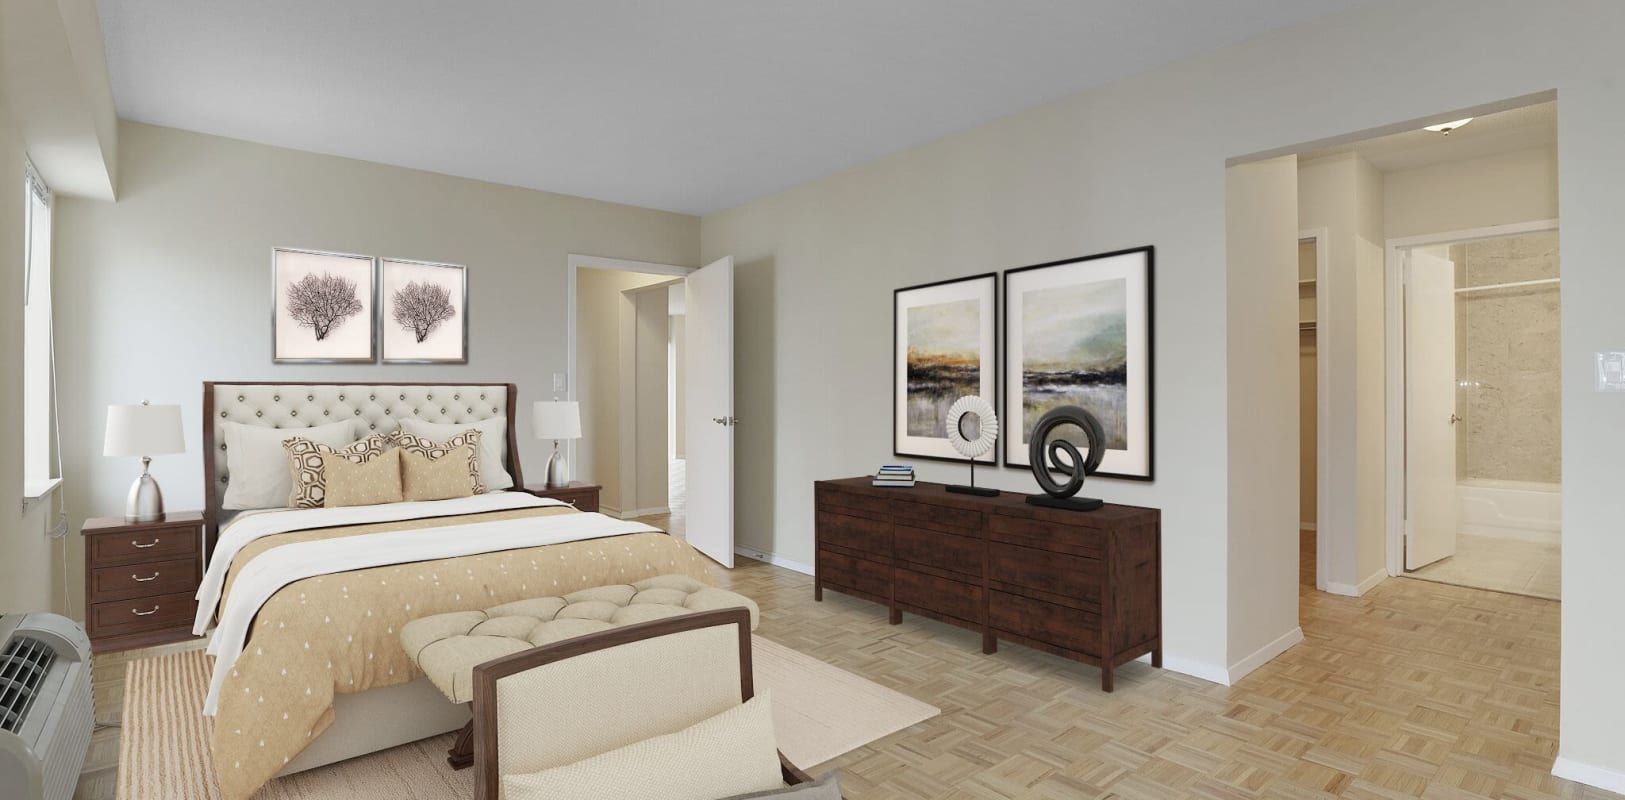 Cozy bedroom at 140 Prospect in Hackensack, New Jersey